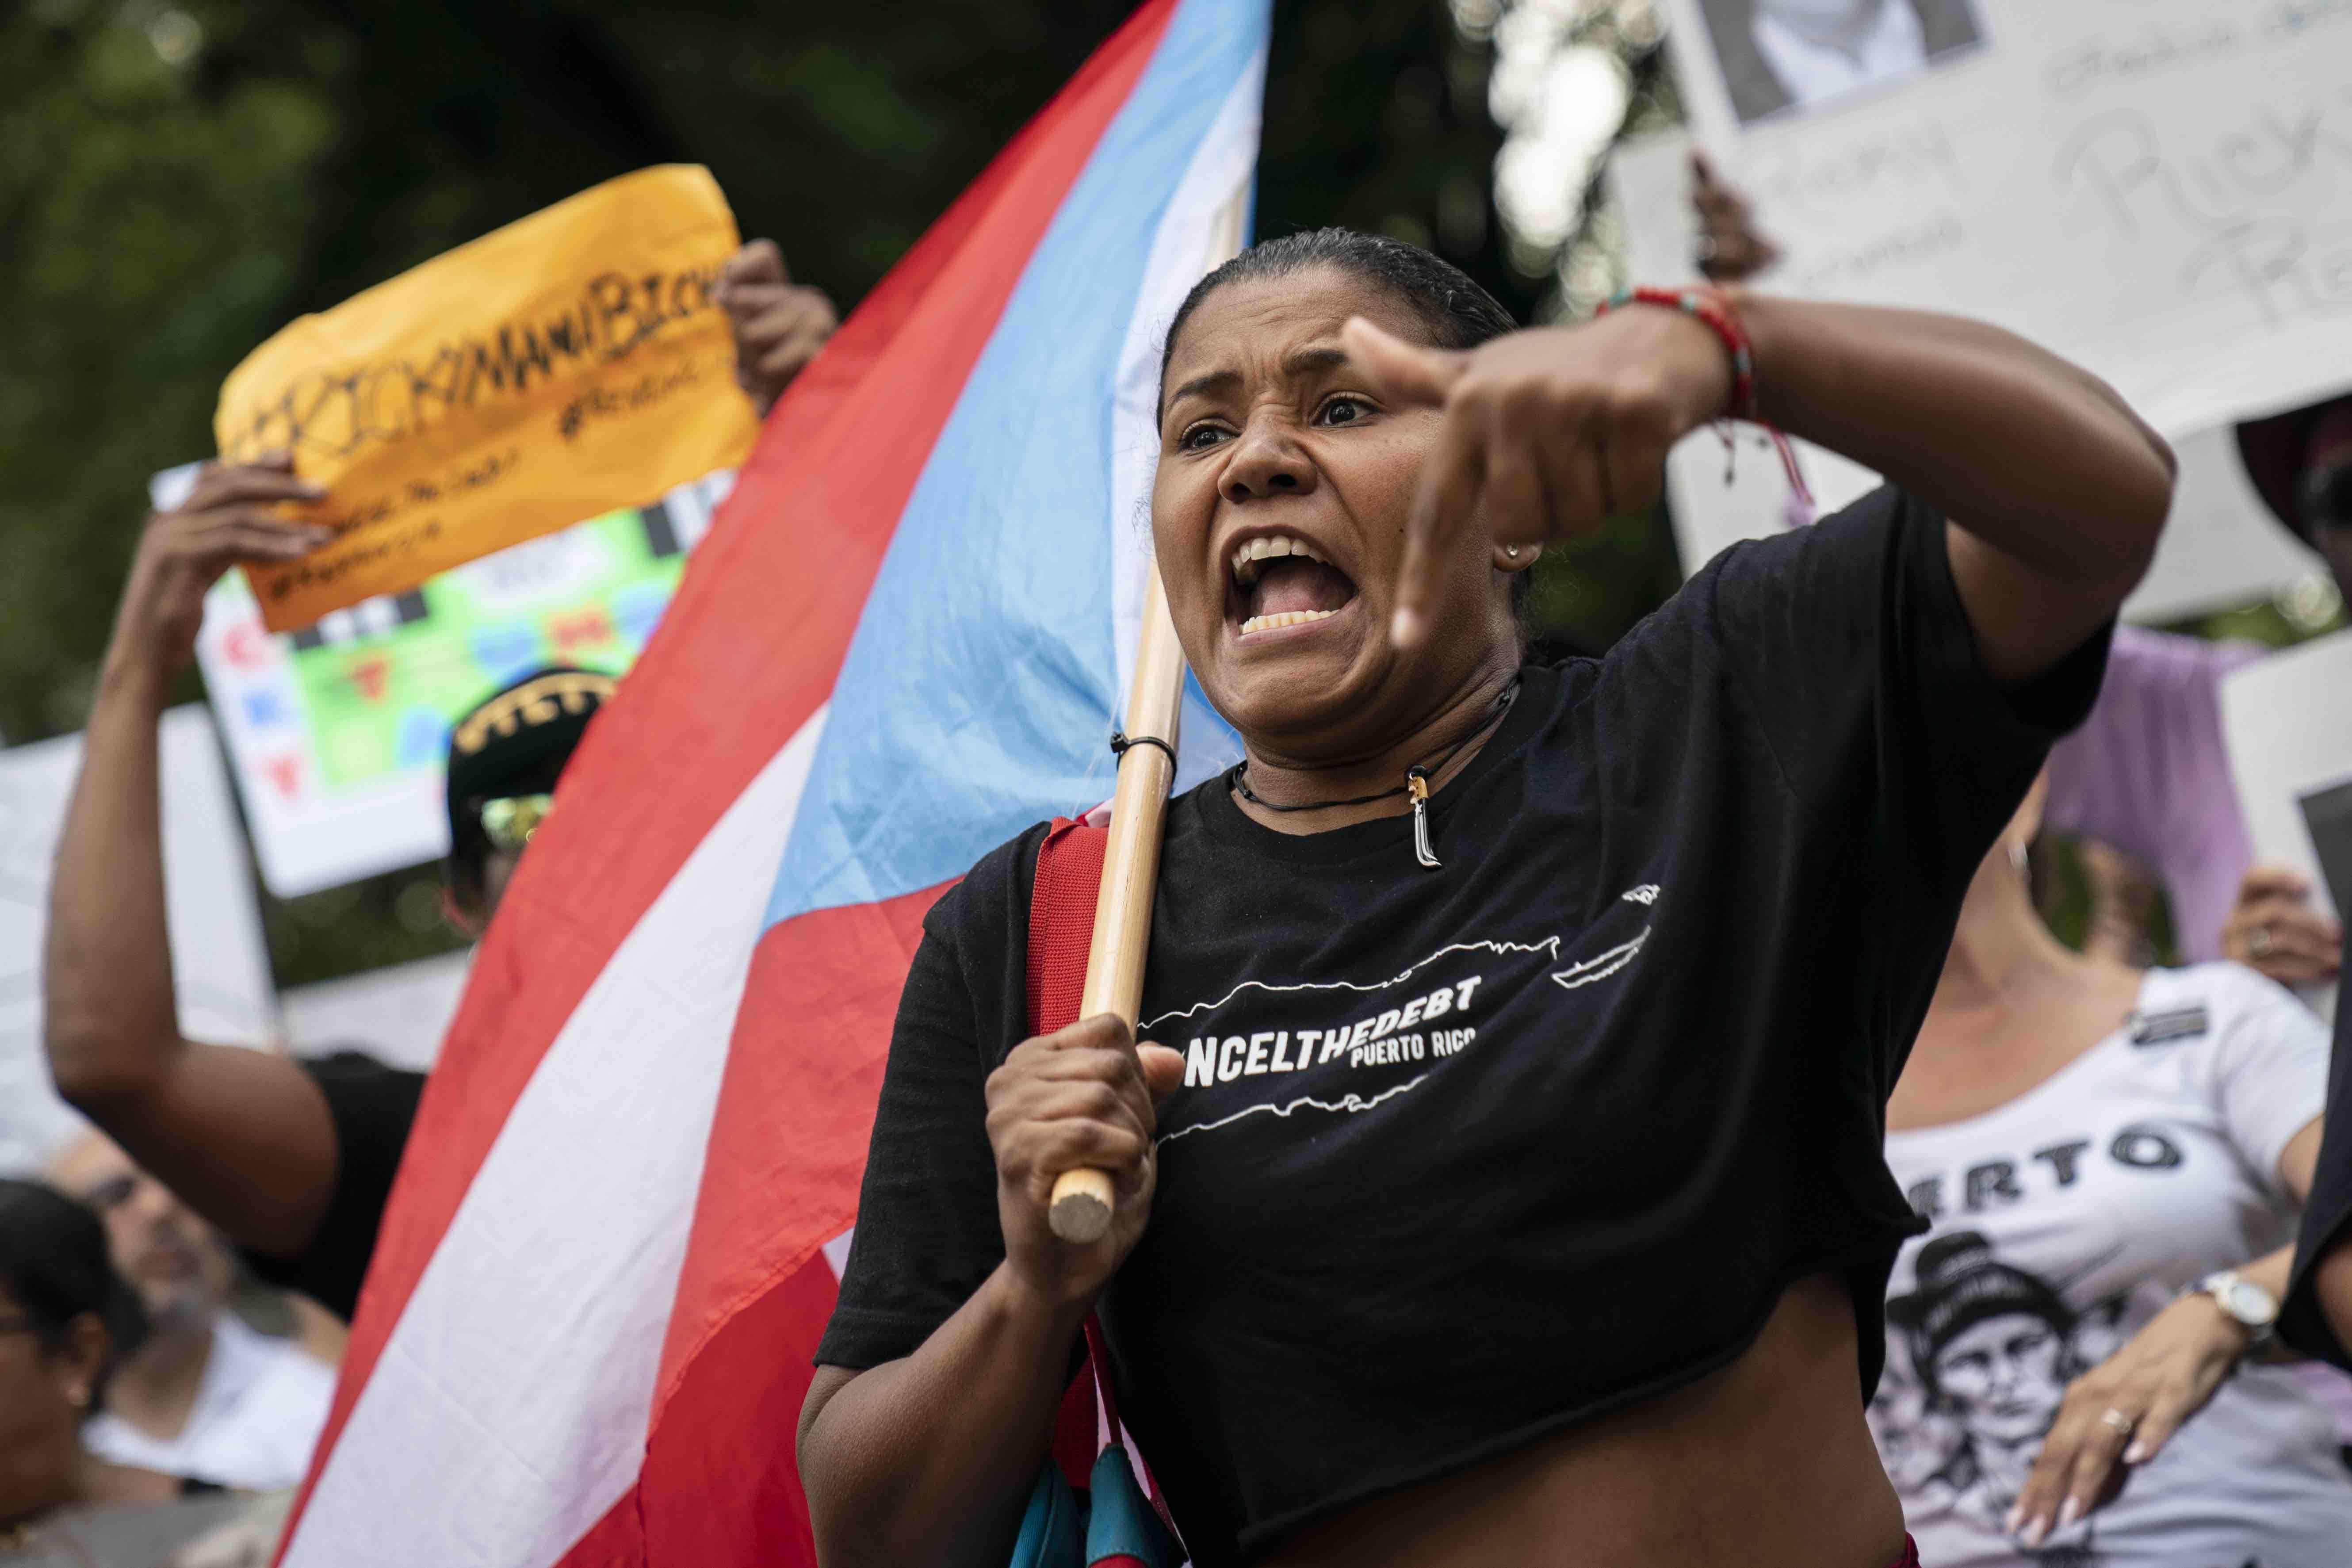 Boricuas Celebrate News That Governor Ricardo Rosselló Has Resigned